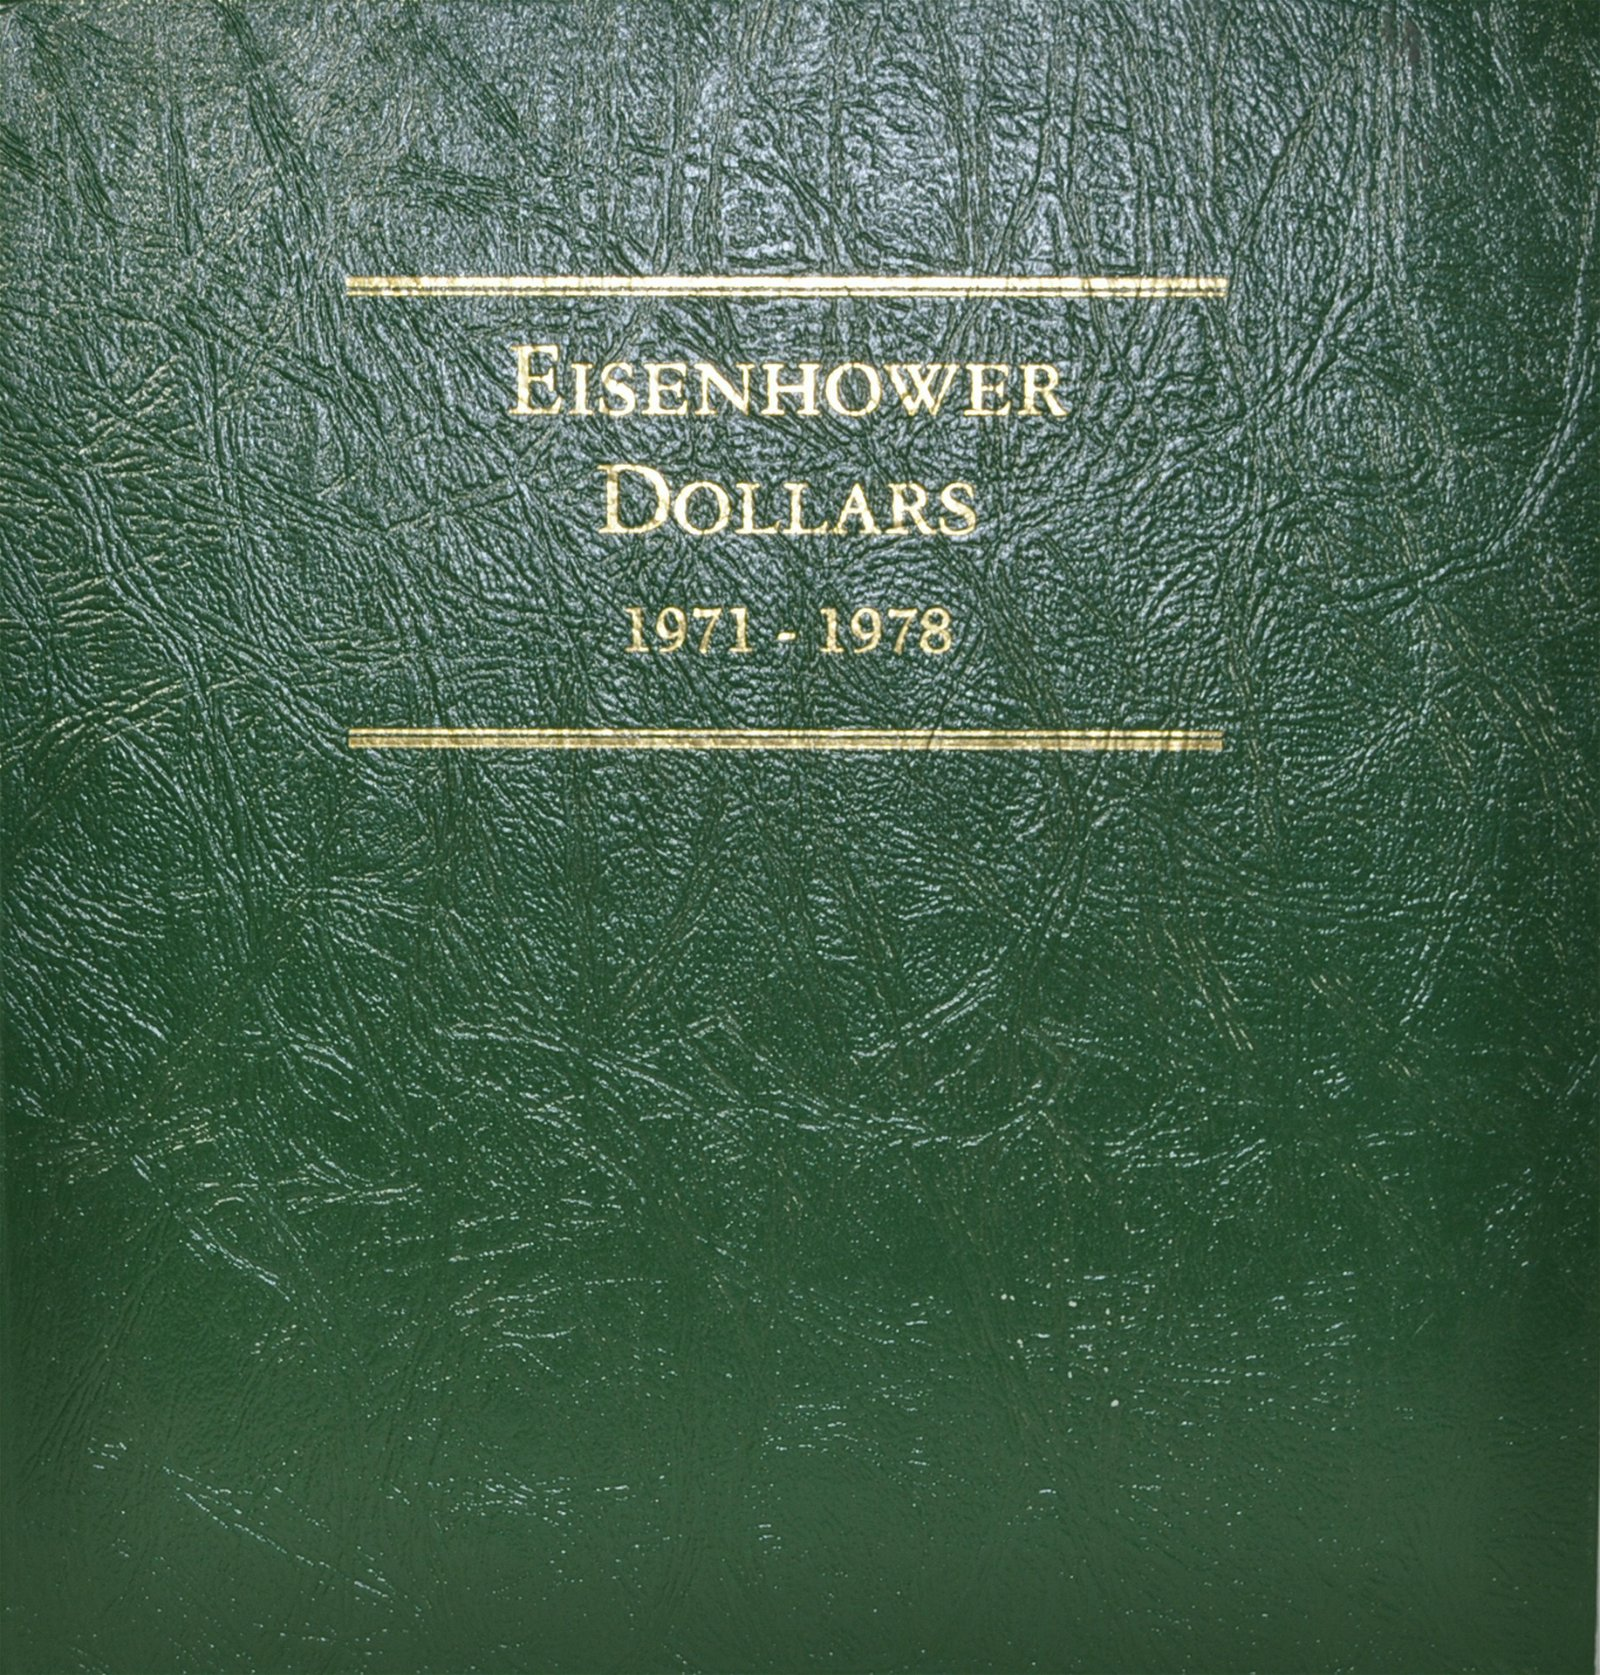 15) Eisenhower Mint State & Proof Dollars